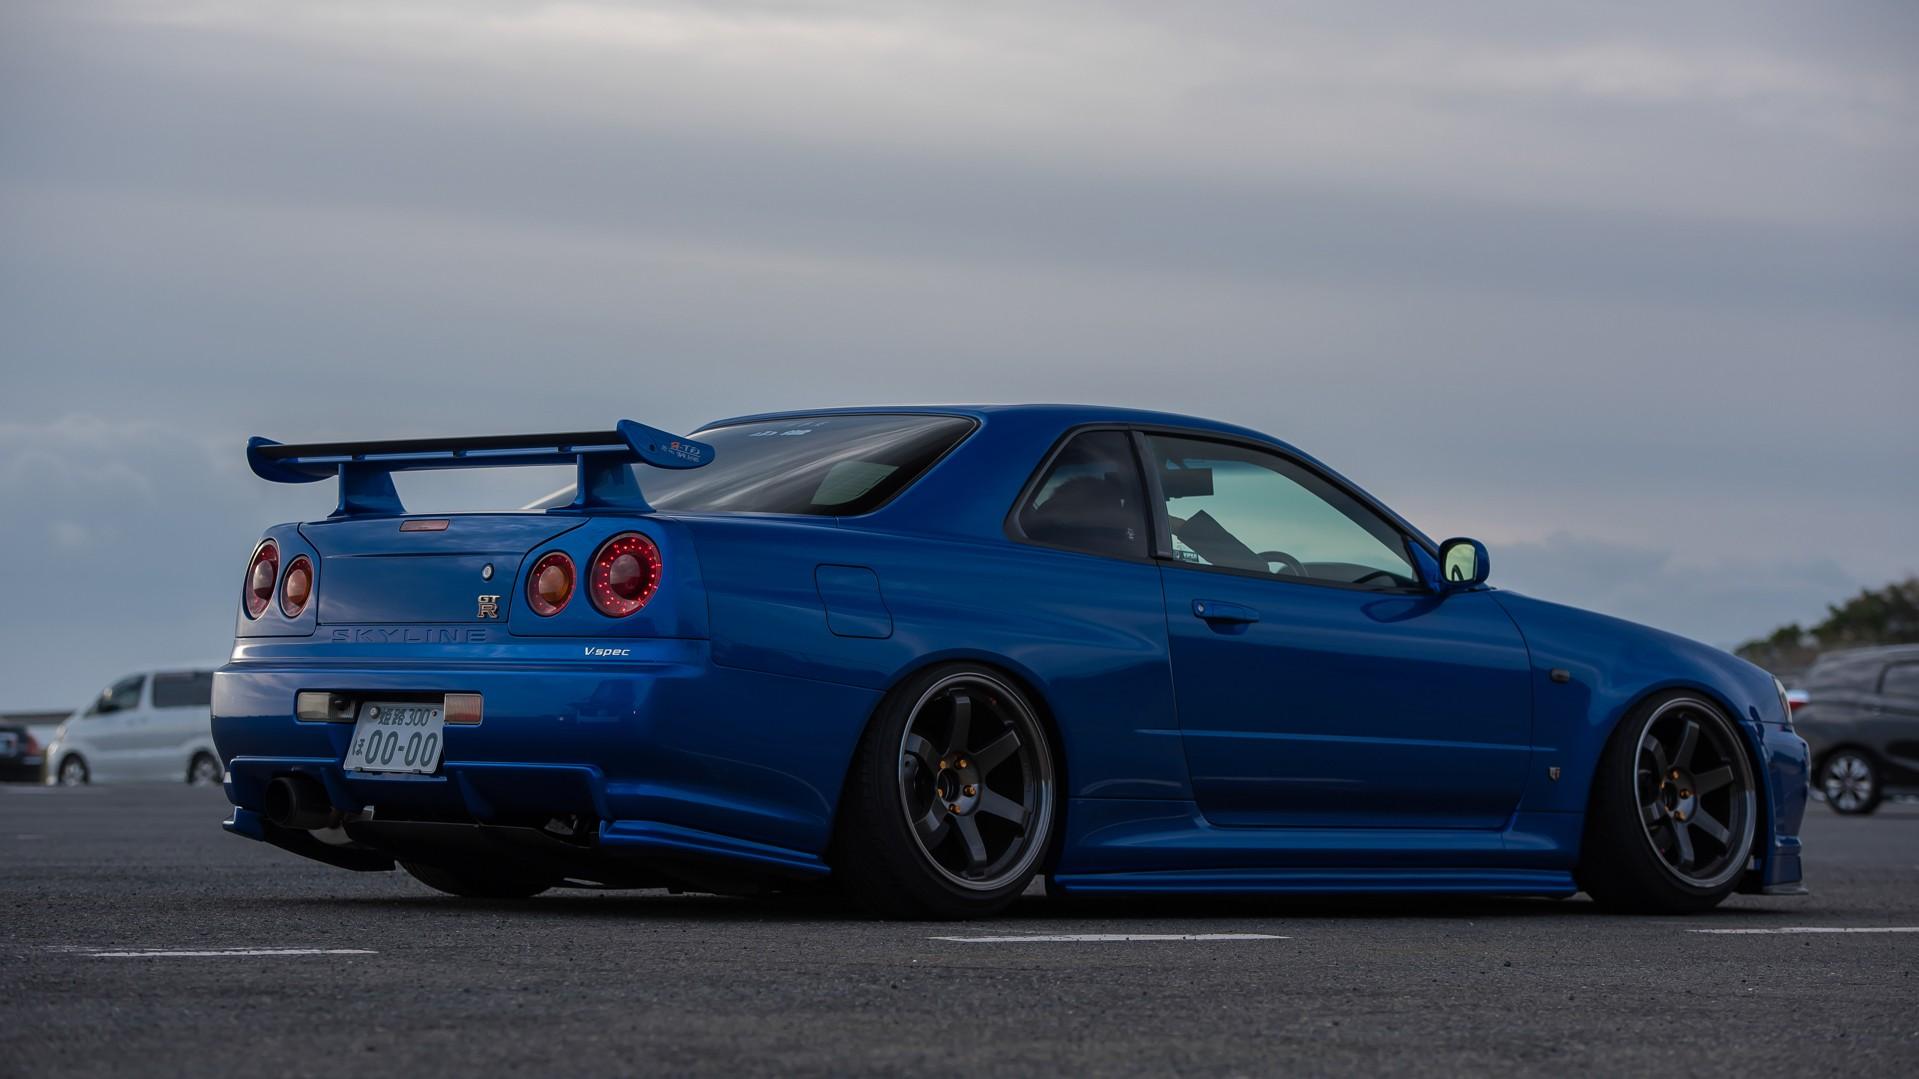 hight resolution of wallpaper blue cars skyline honda jdm wheels sports car nissan skyline stance performance car skyline r34 camber nissan skyline gt r r34 nismo